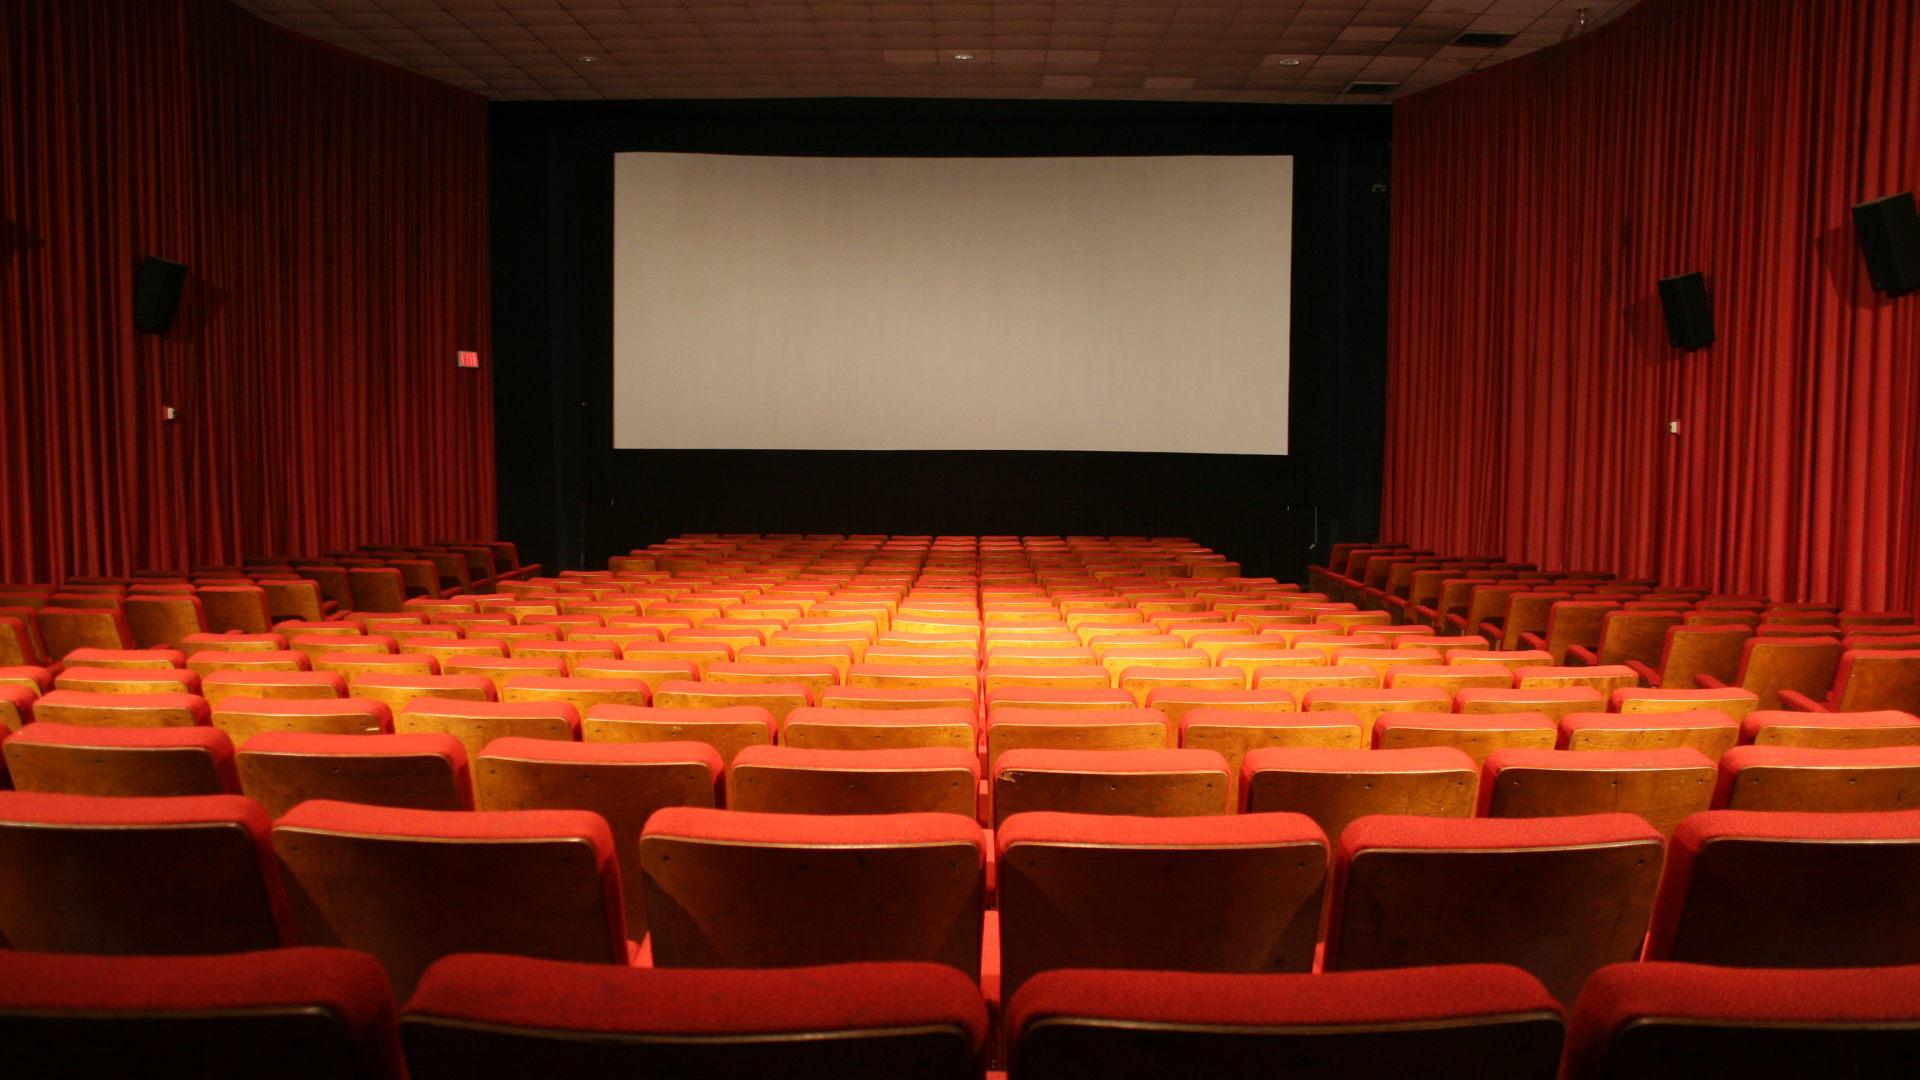 cinema-movie-theater.jpg